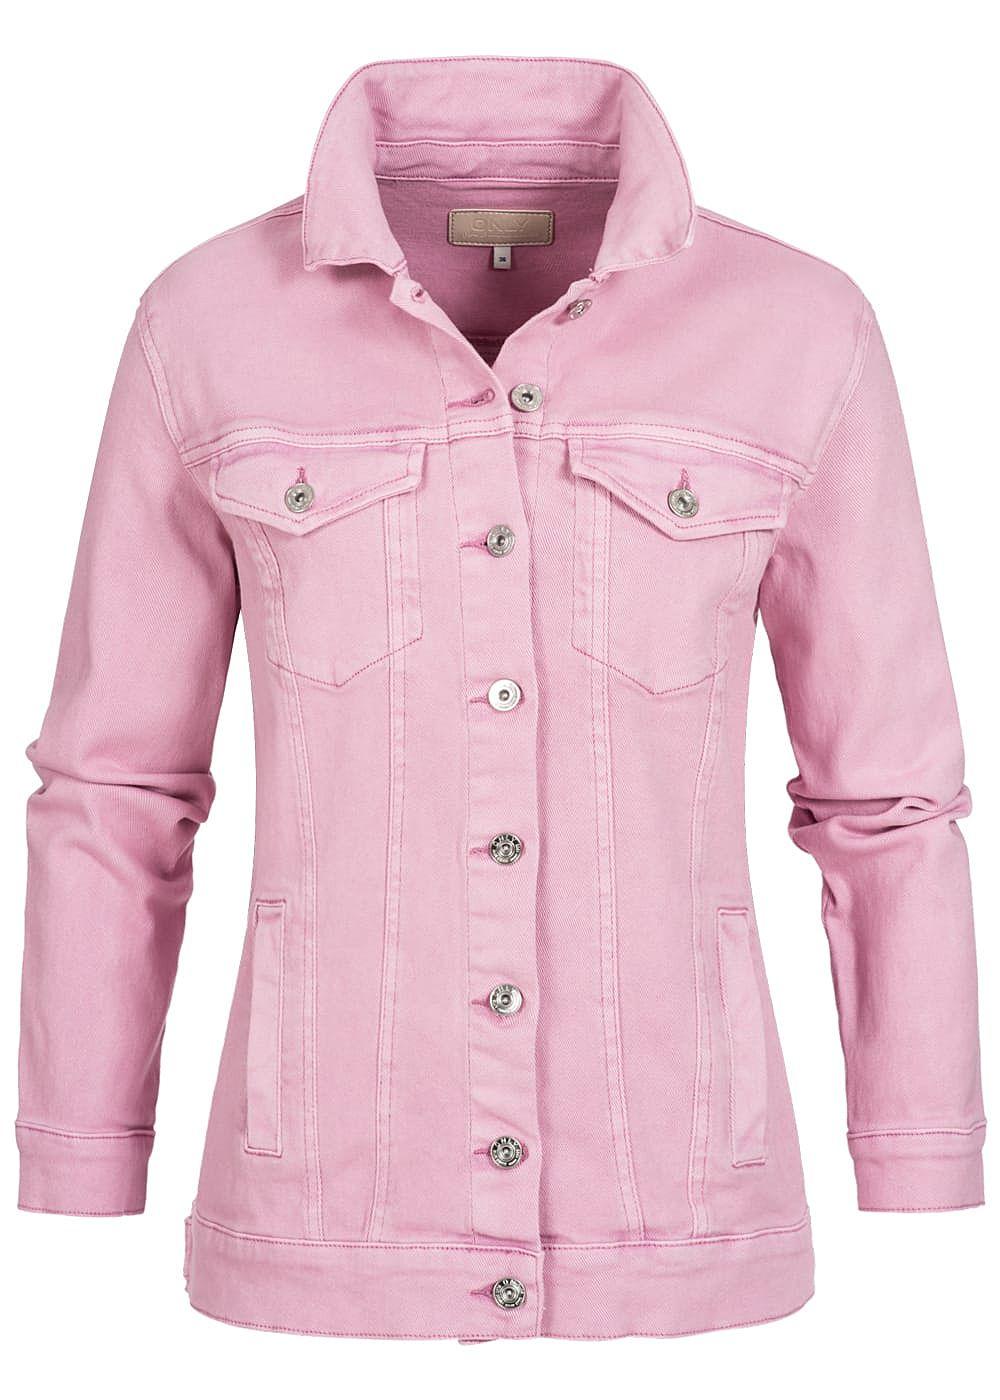 only damen oversize jeansjacke 2 brusttaschen 2 deko taschen begonia pink 77onlineshop. Black Bedroom Furniture Sets. Home Design Ideas